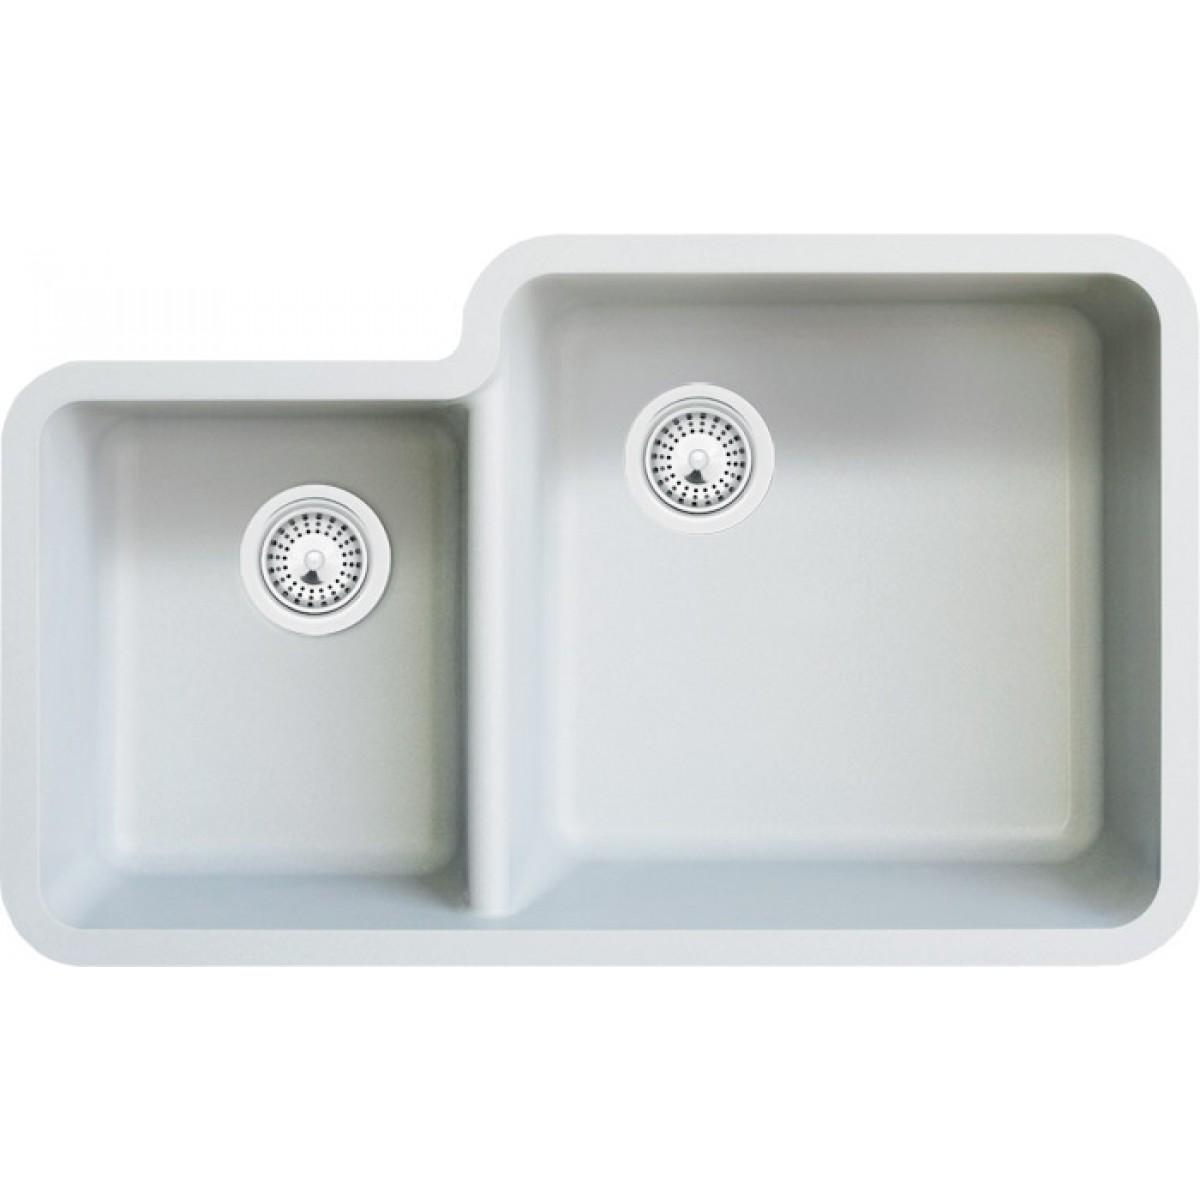 White Quartz Composite 40/60 Double Bowl Undermount Kitchen Sink ...